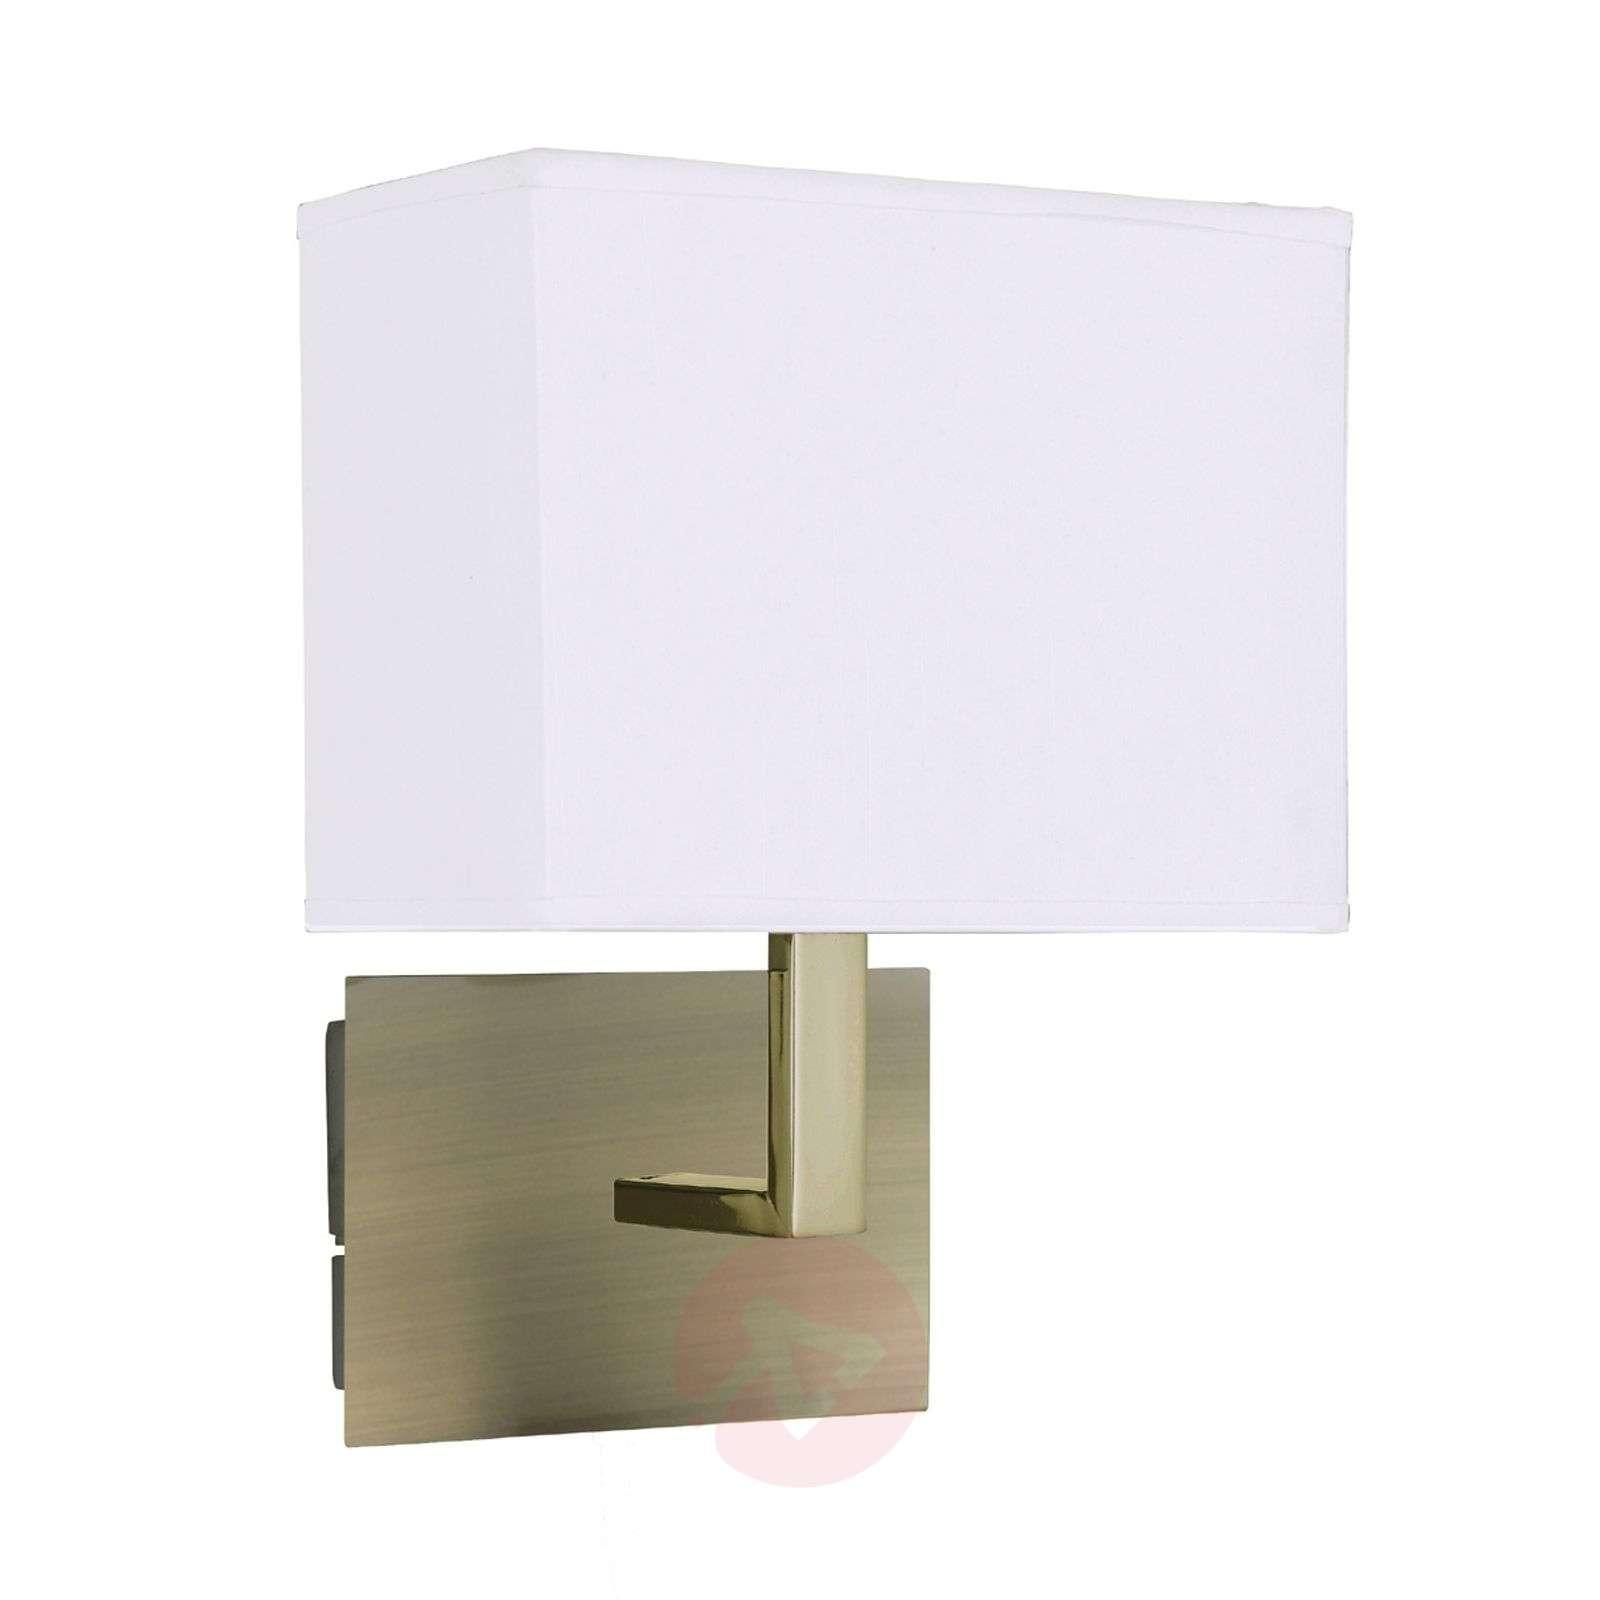 DARIO wall light with fabric lampshade-8570452-01